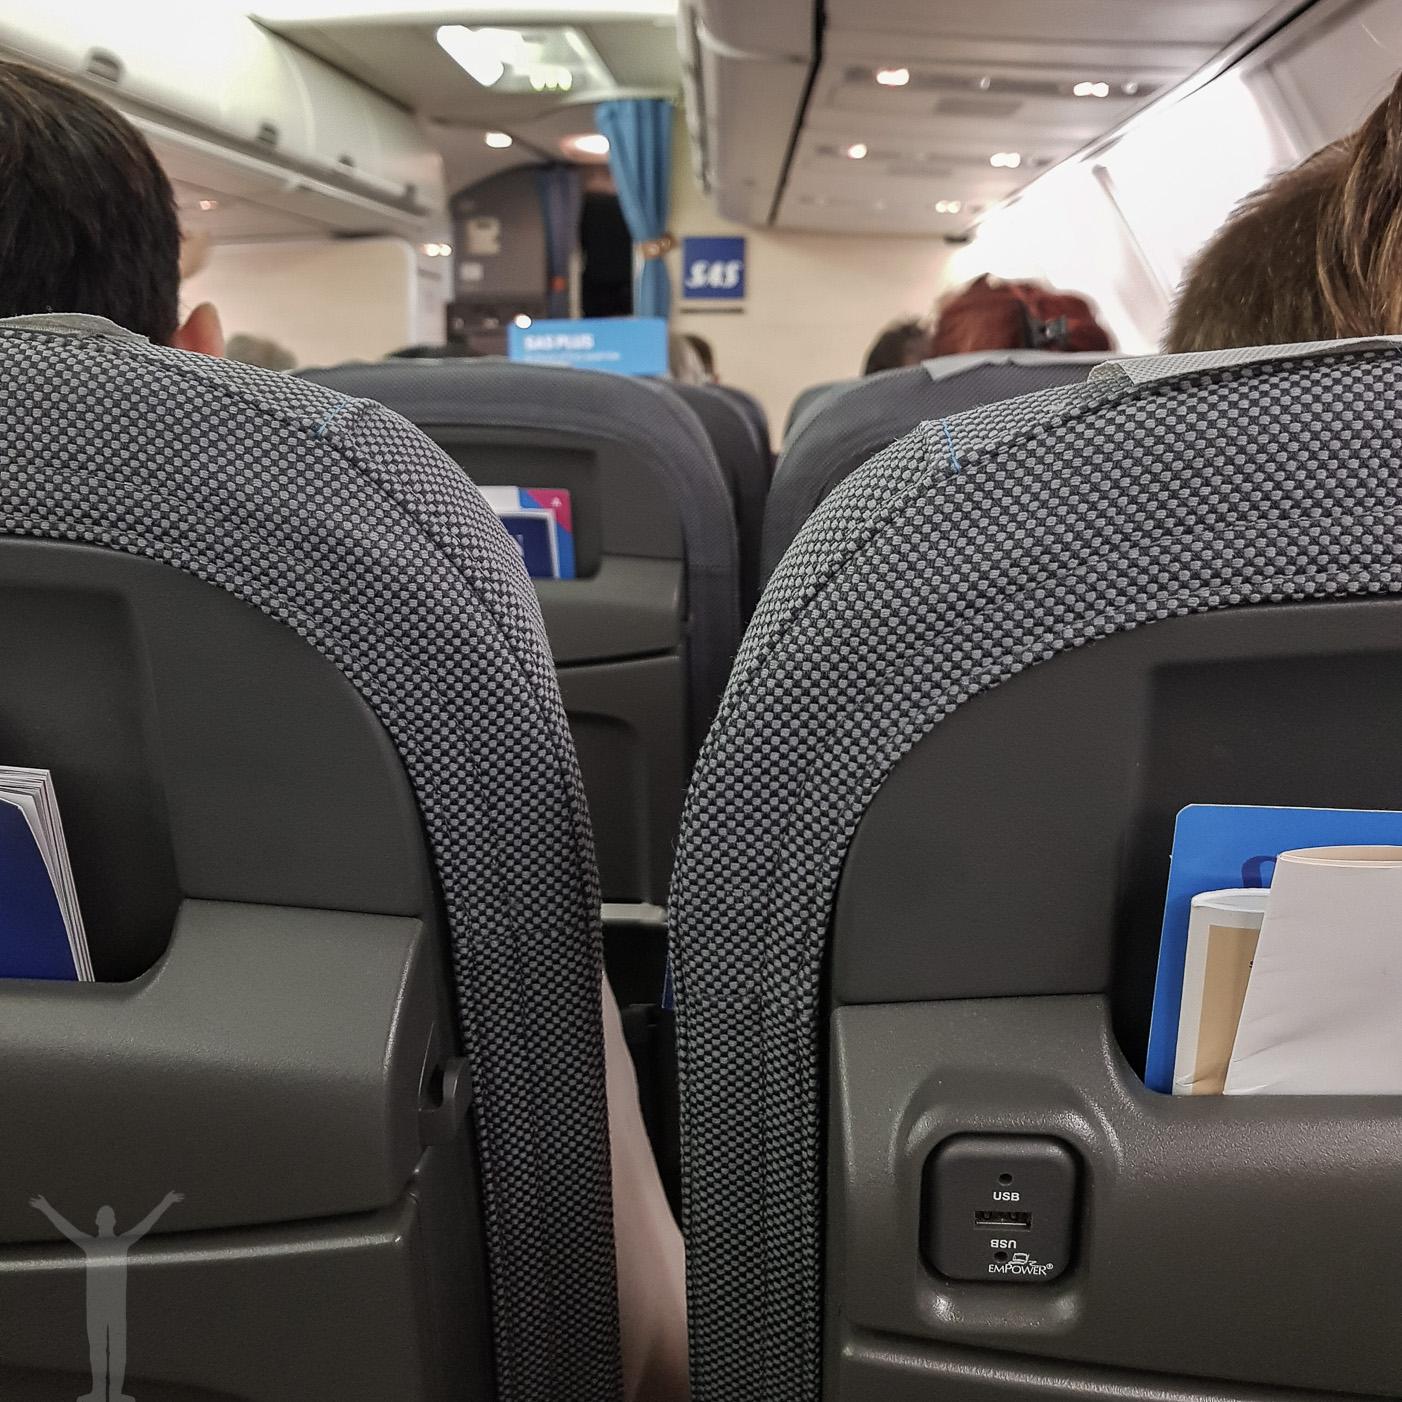 SAS nya kabin även på en Boeing 737